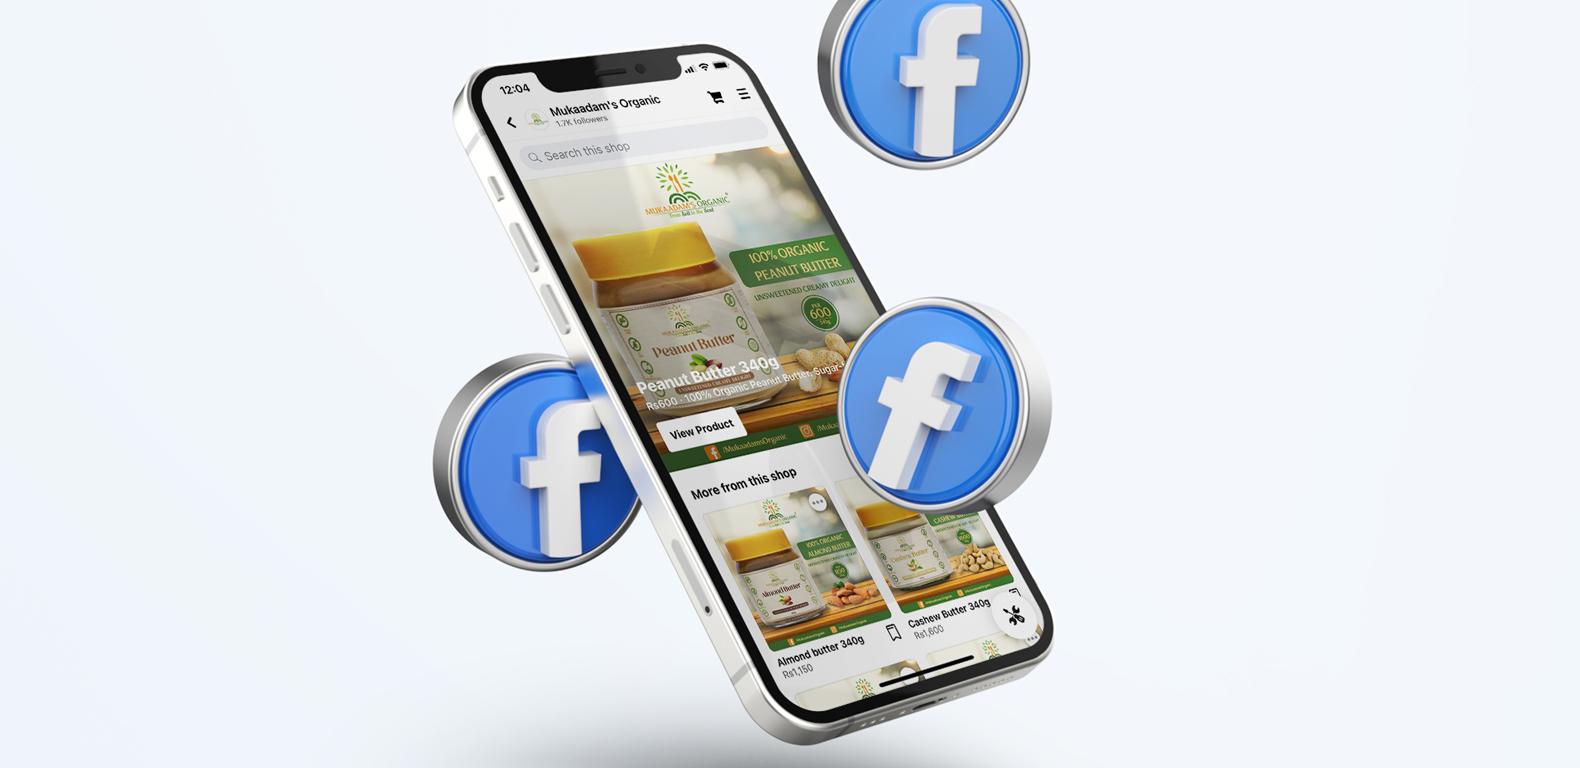 social-media-marketing-mukaadams-organic-facebook-posts-2